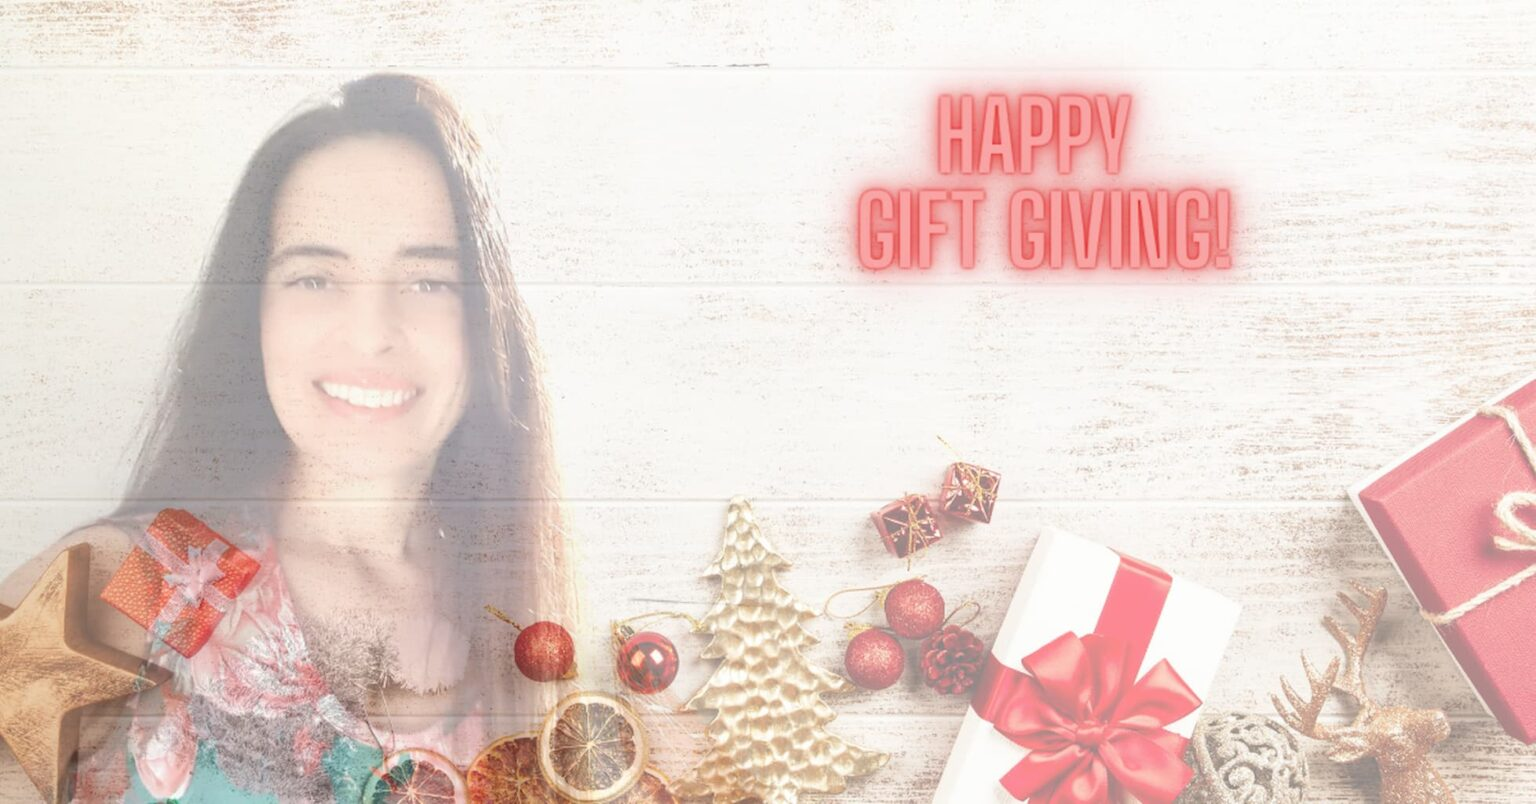 Gisella Casolaro Happy Gift Giving